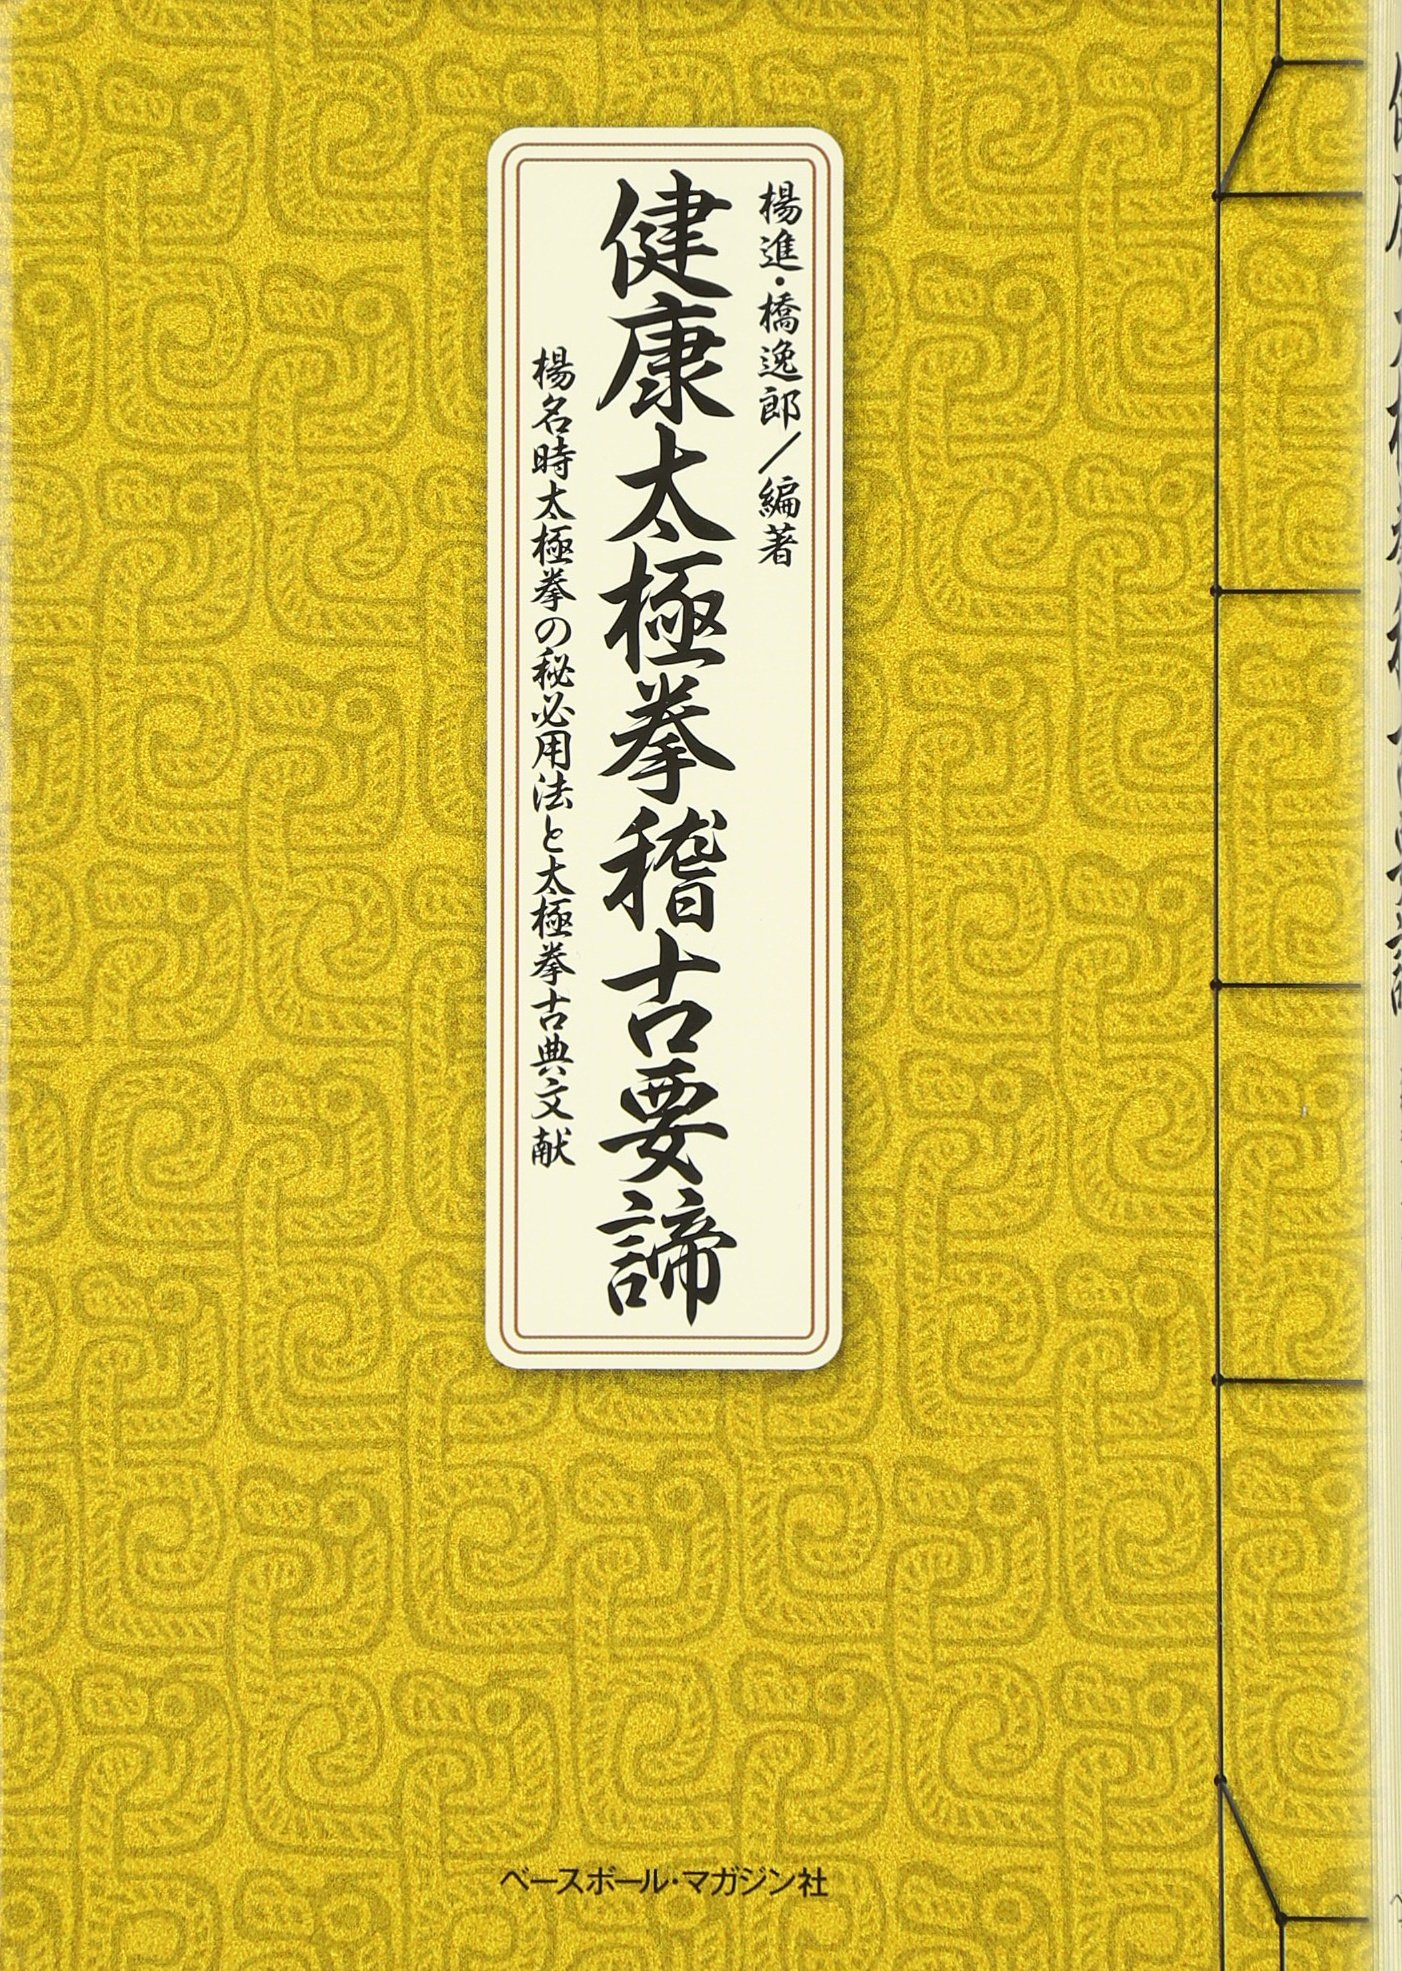 Download Kenkō taikyokuken keiko yōtei : Yō meiji taikyokuken no hitsuhi yōhō to taikyokuken koten bunken pdf